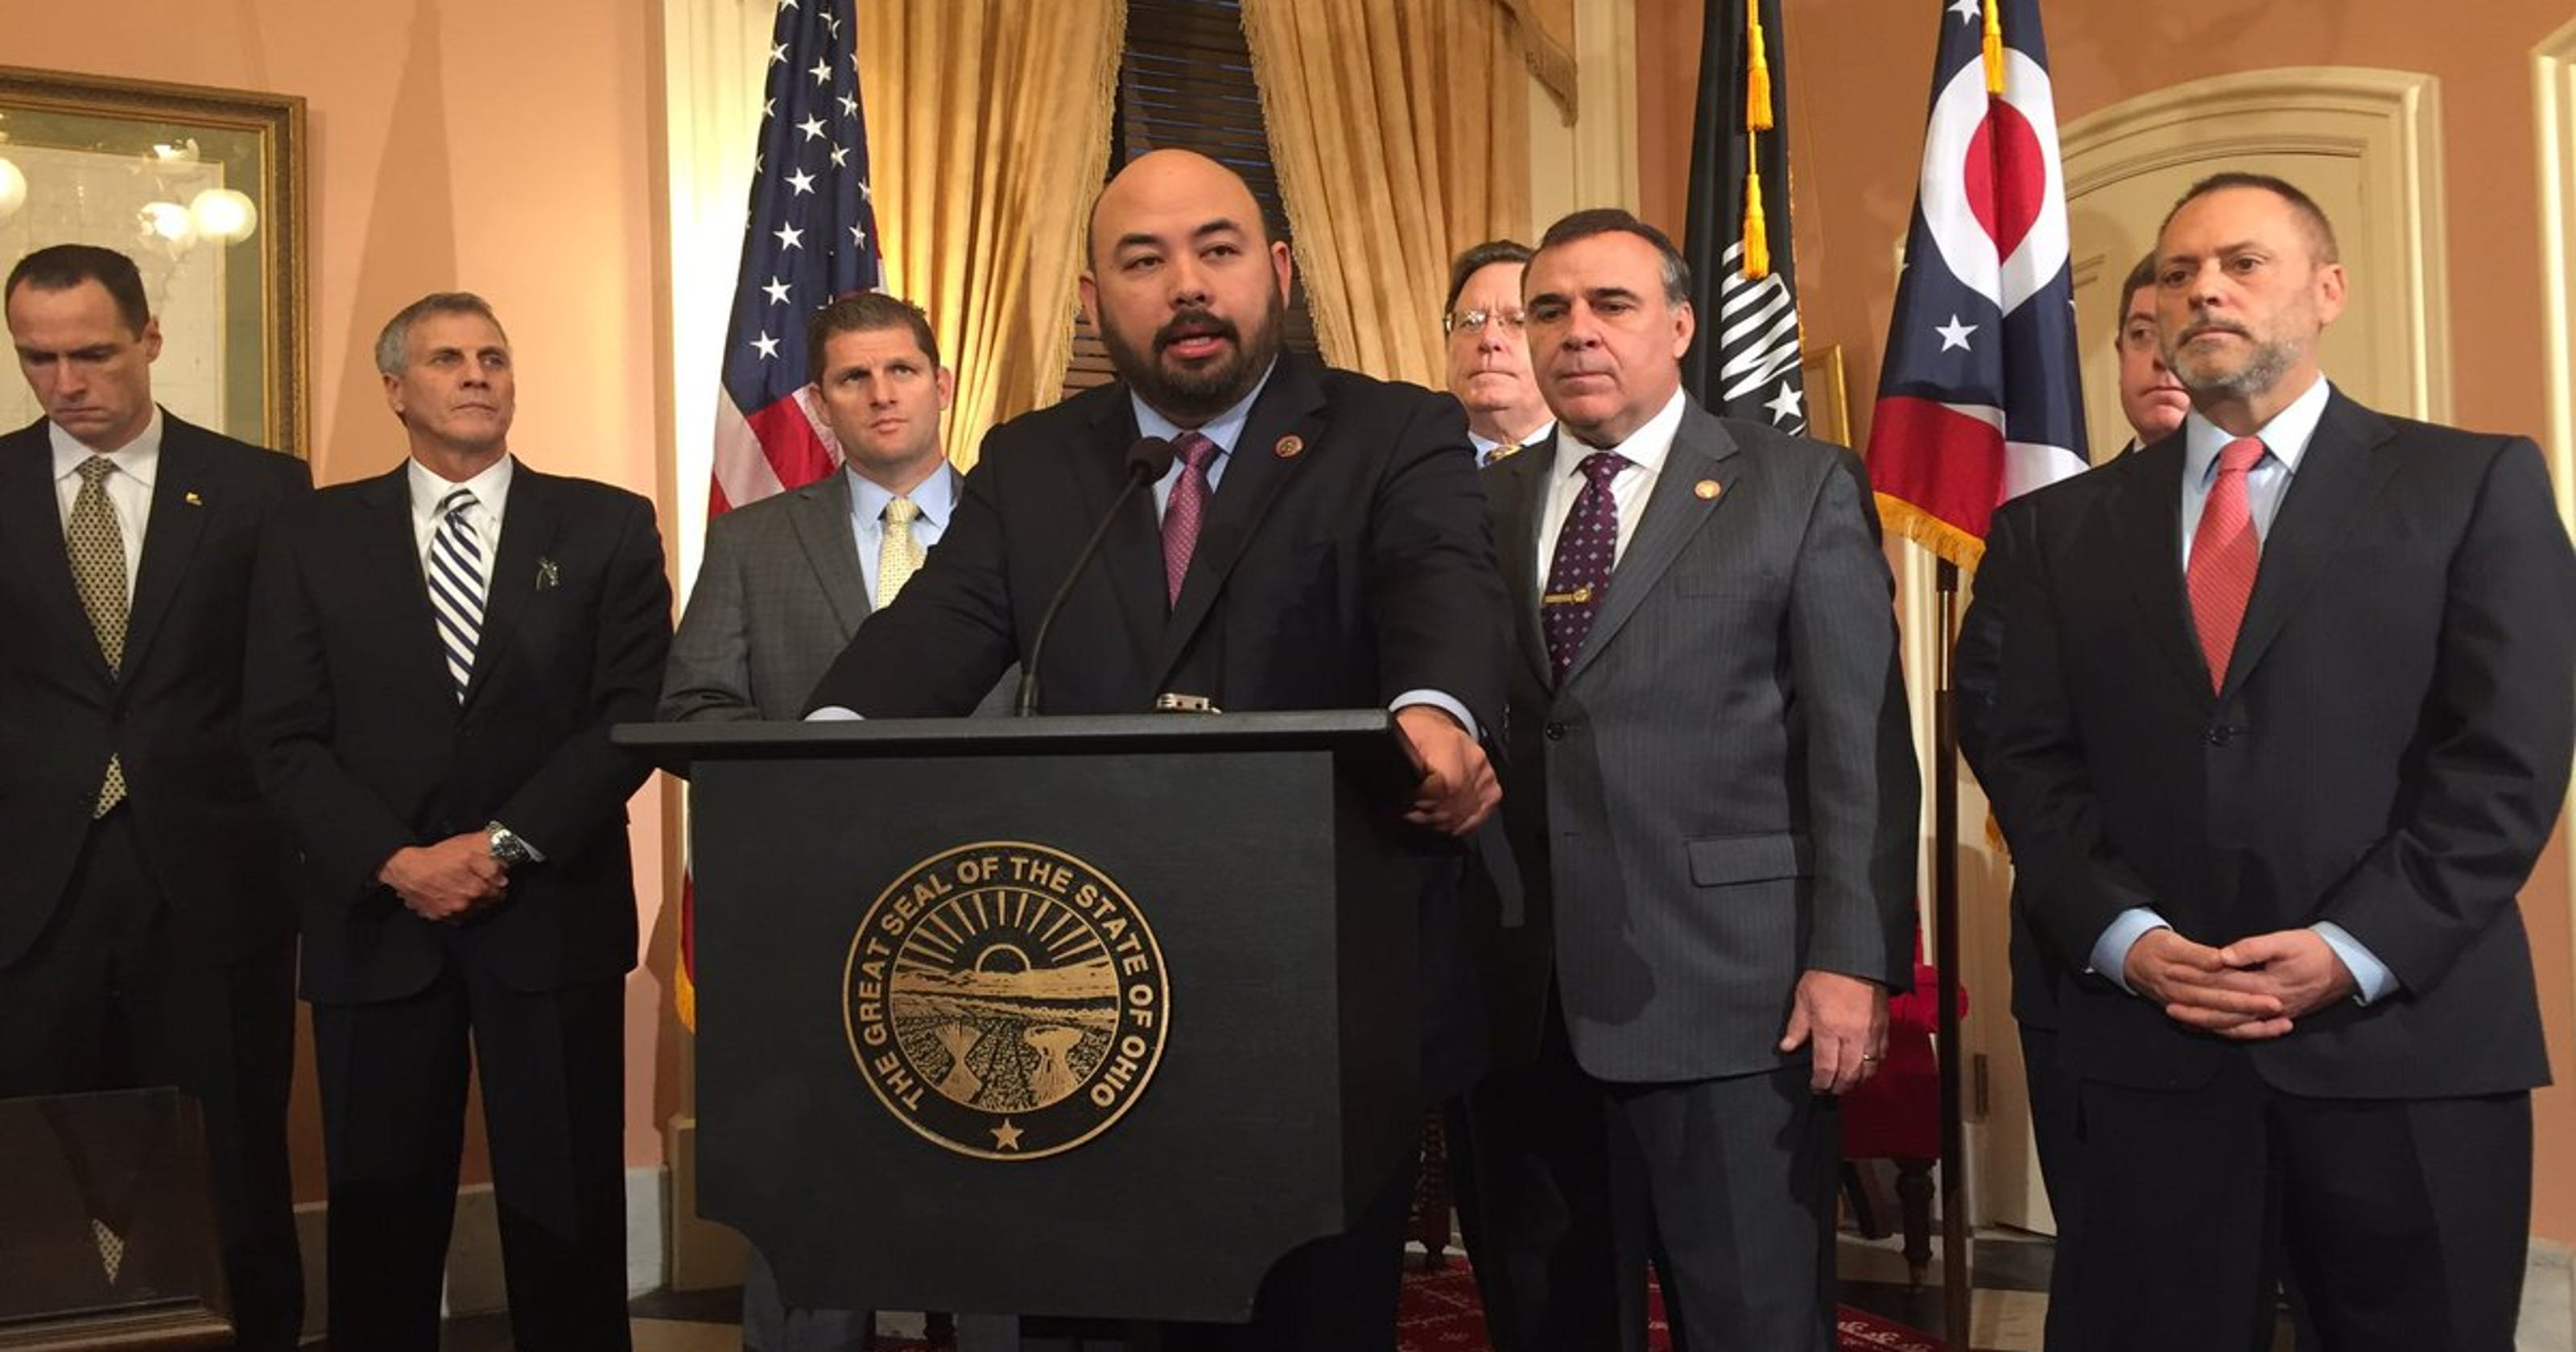 amid fbi investigation, ohio house speaker cliff rosenberger resigns